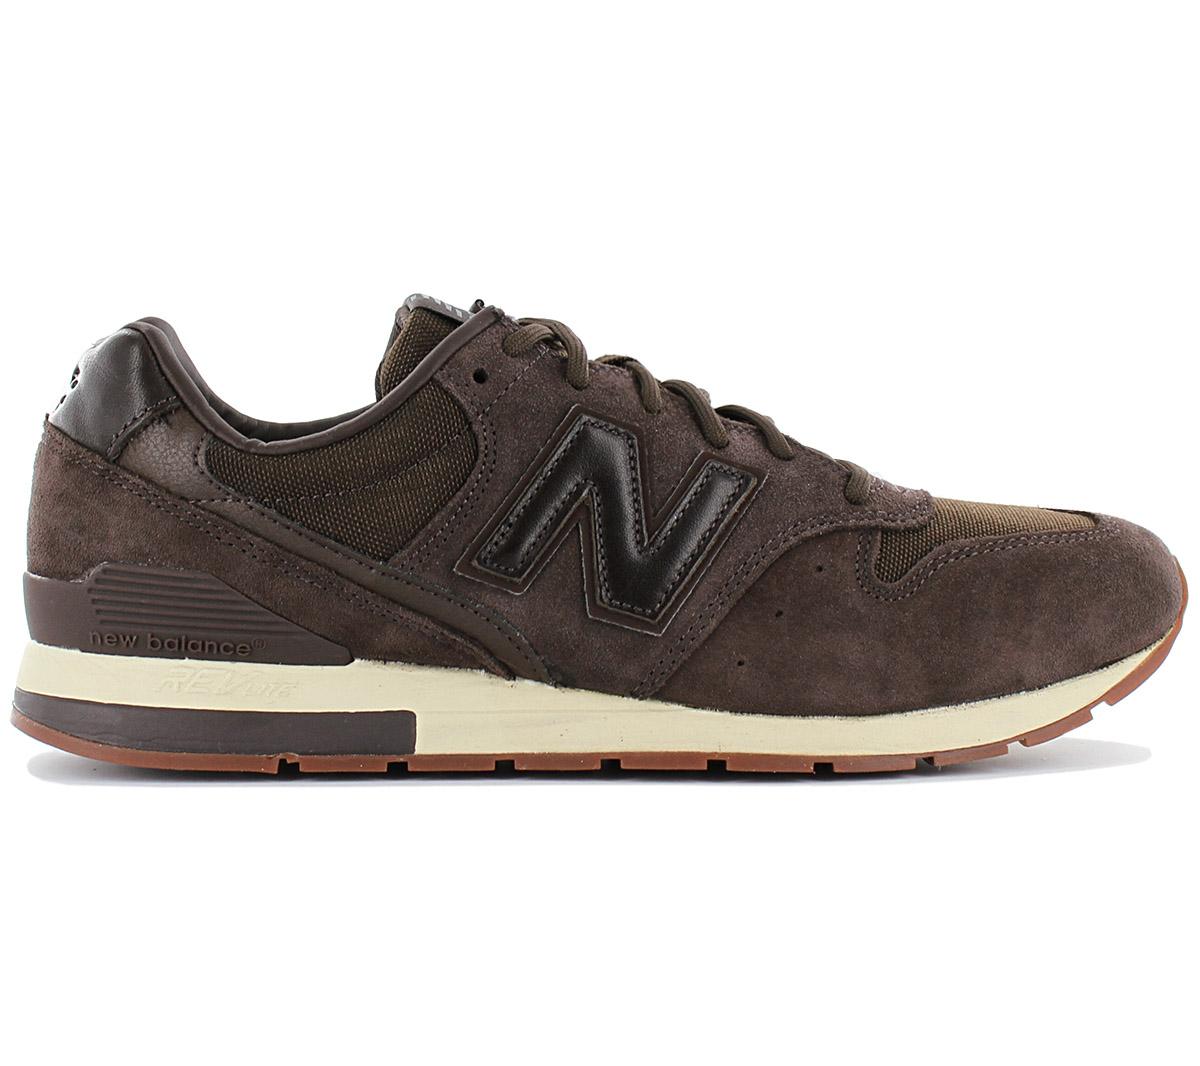 0eb97c7eb50 New Balance Lifestyle 996 Revlite Men s Sneakers Shoe Sneaker ...